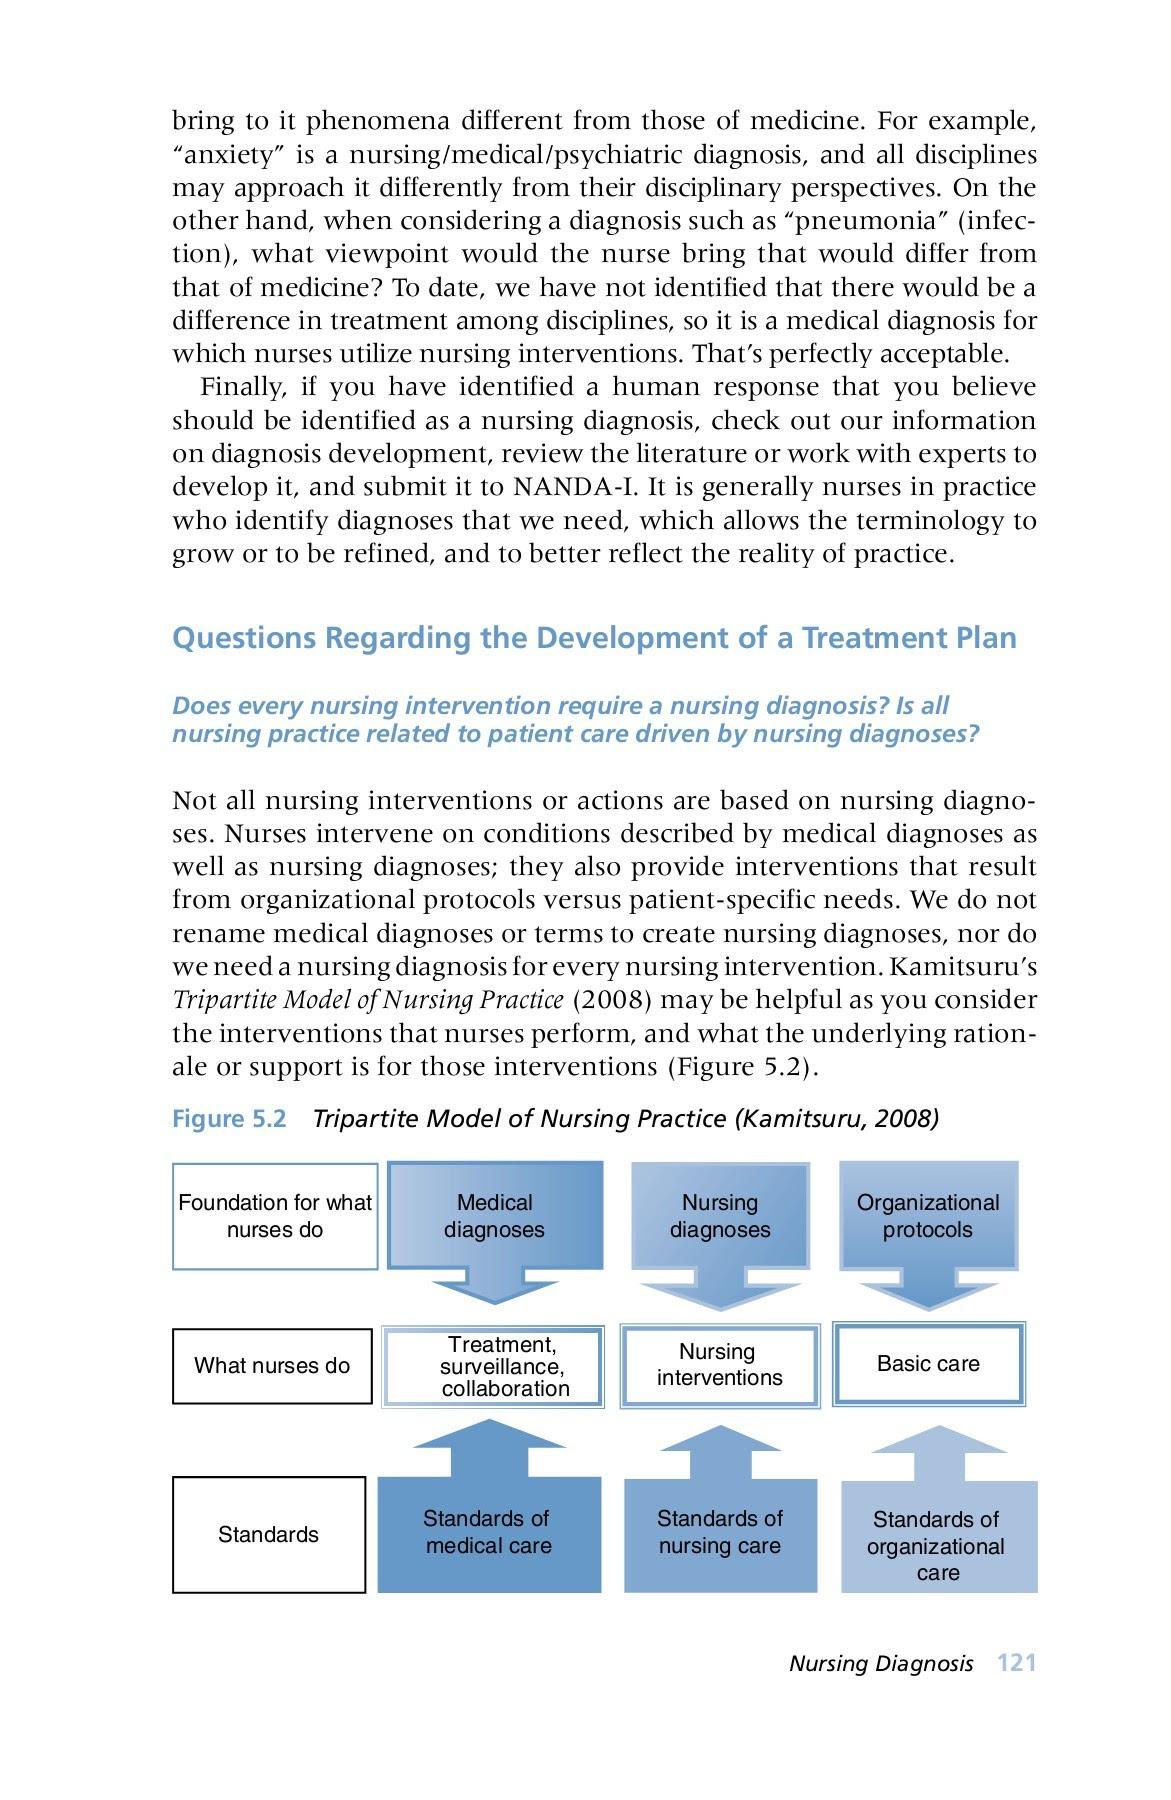 Imbalanced Nutrition Nursing Diagnosis For Newborn ...